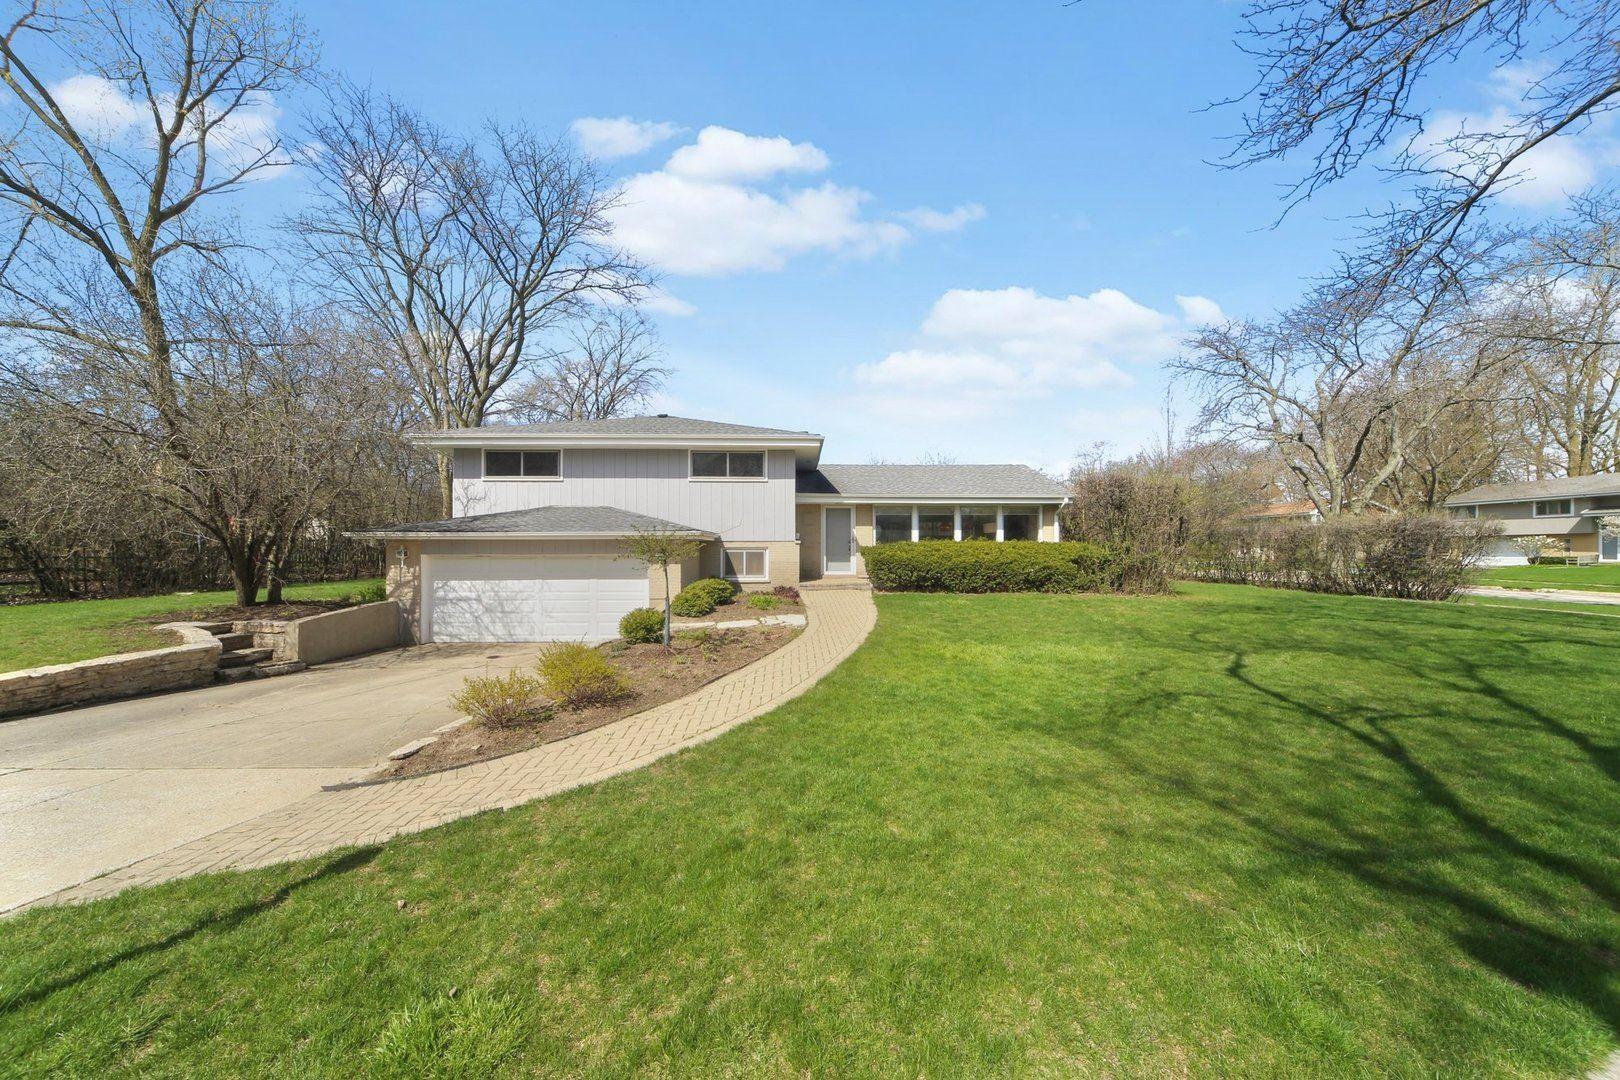 1730 Heather Lane, Highland Park, IL 60035 - #: 10685828